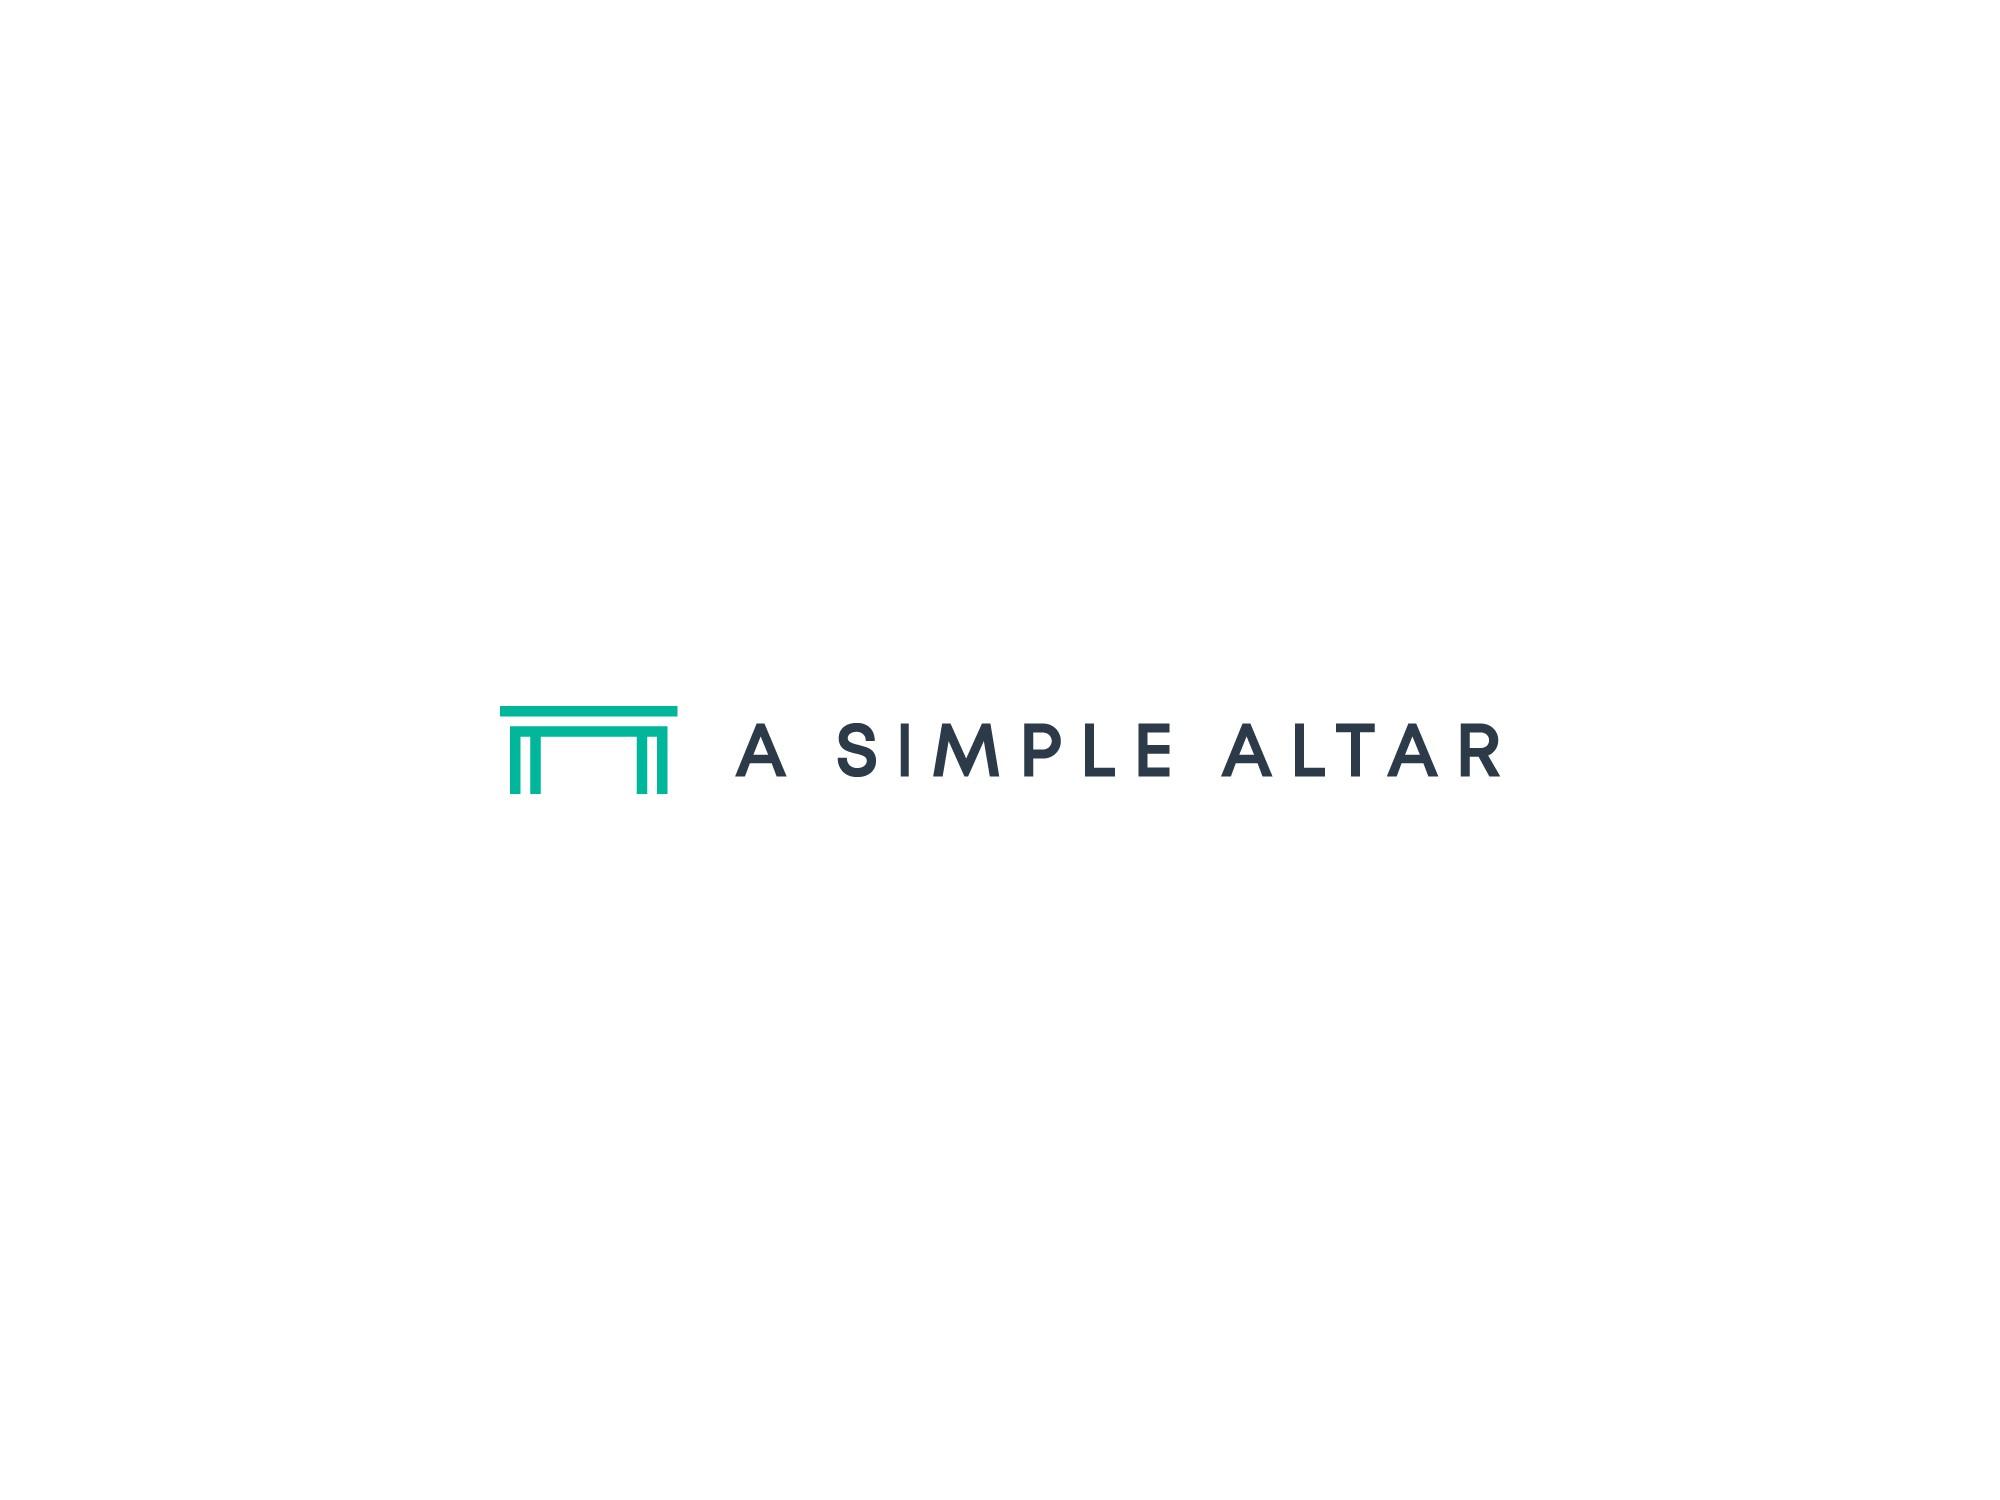 Design a clean & modern logo for online religious website/blog